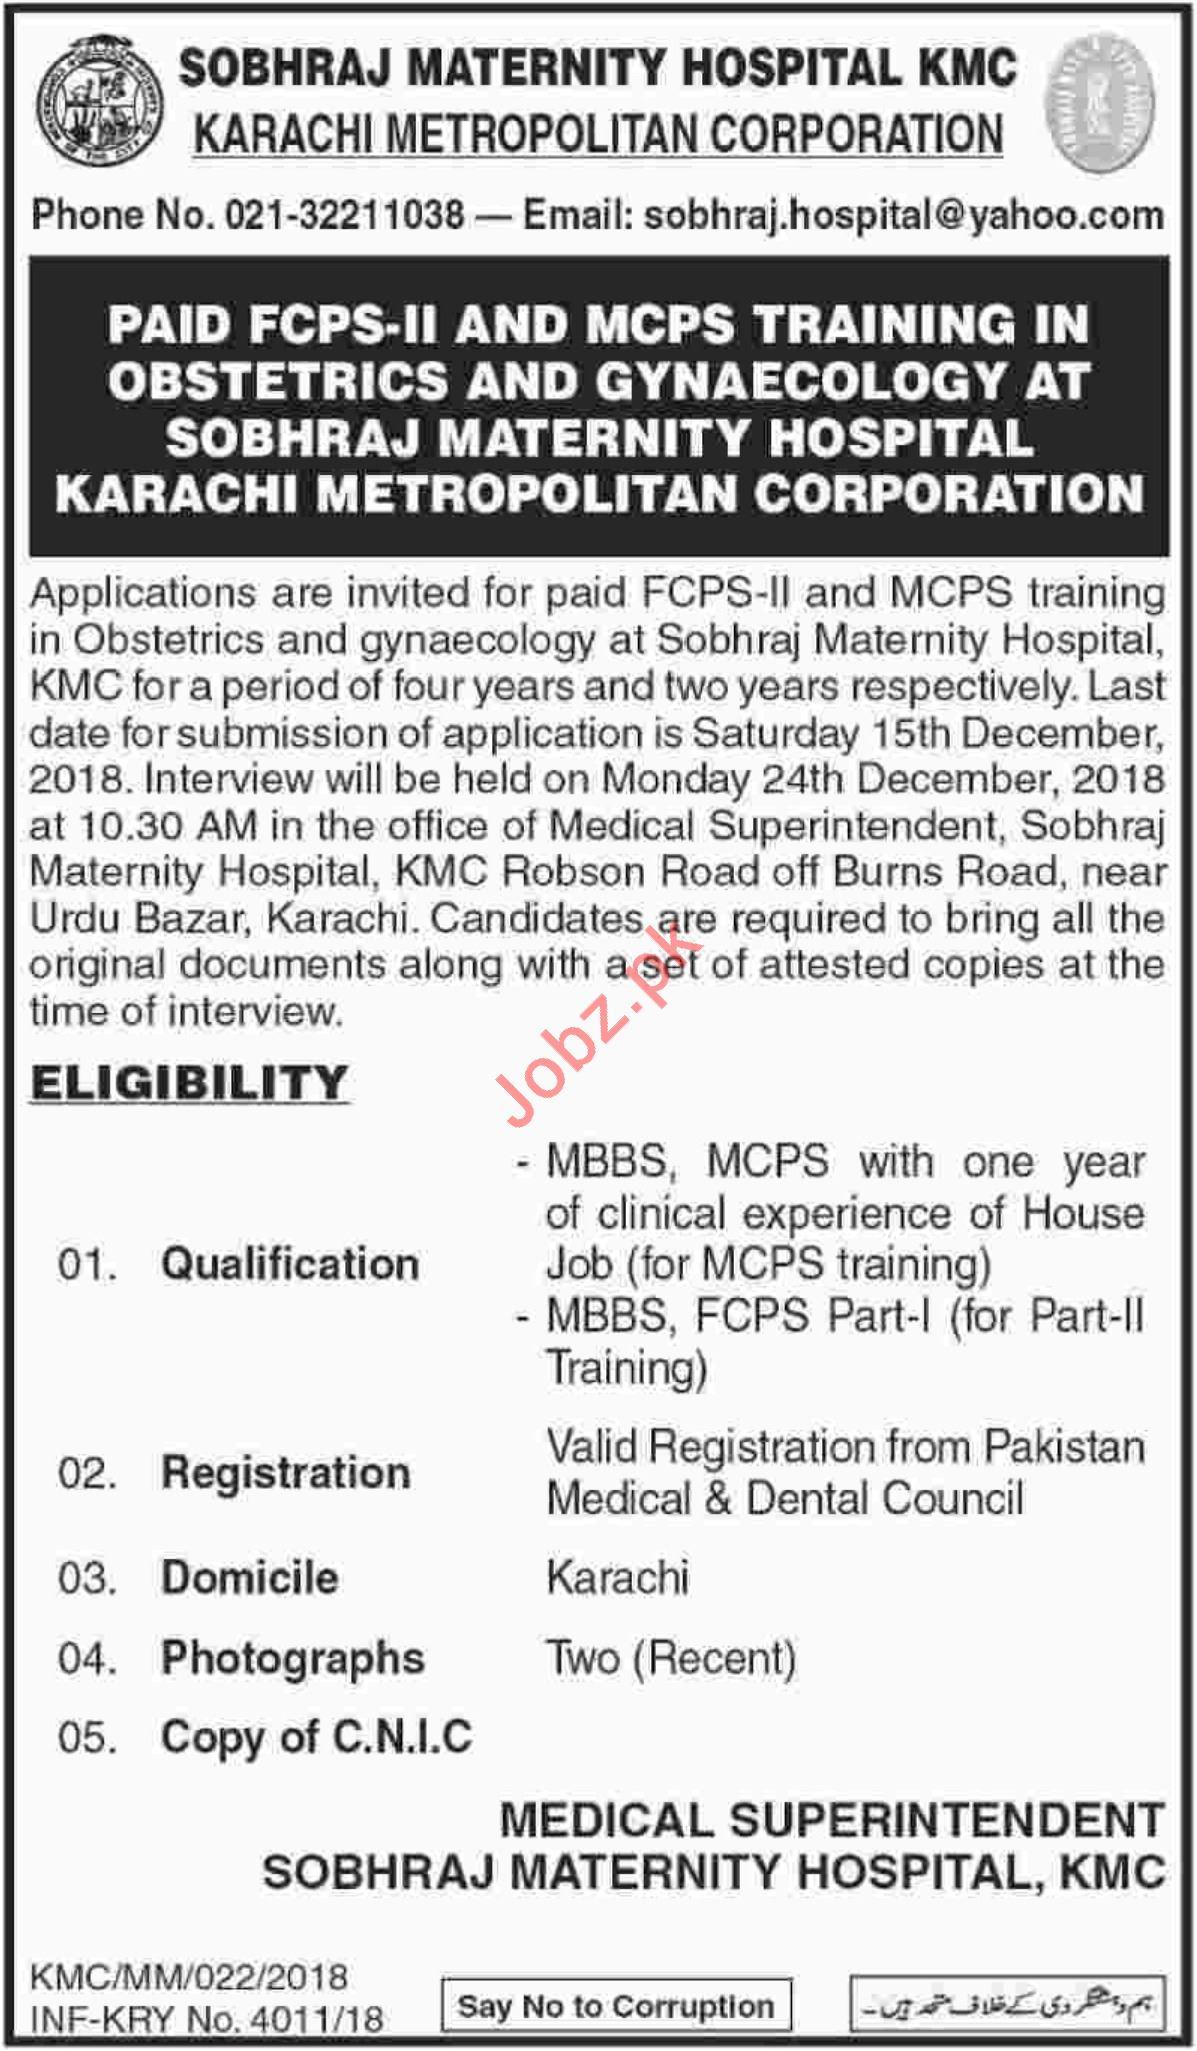 Sobhraj Maternity Hospital KMC Jobs for Medical Specialist